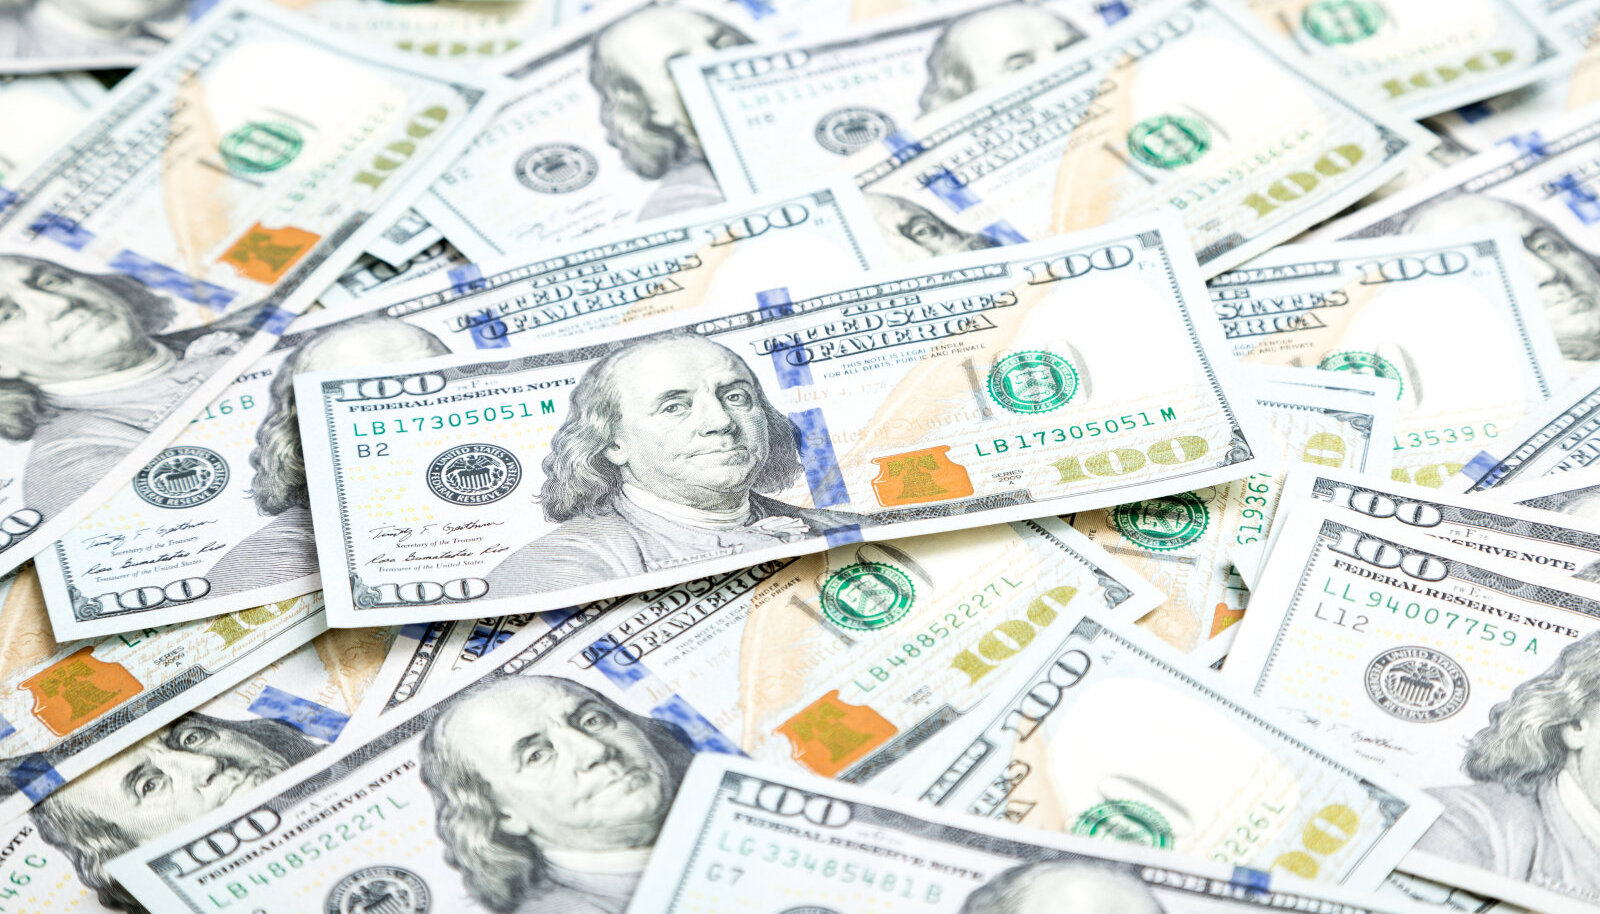 Benjamin Franklin on USA 100-dollarilisel rahal